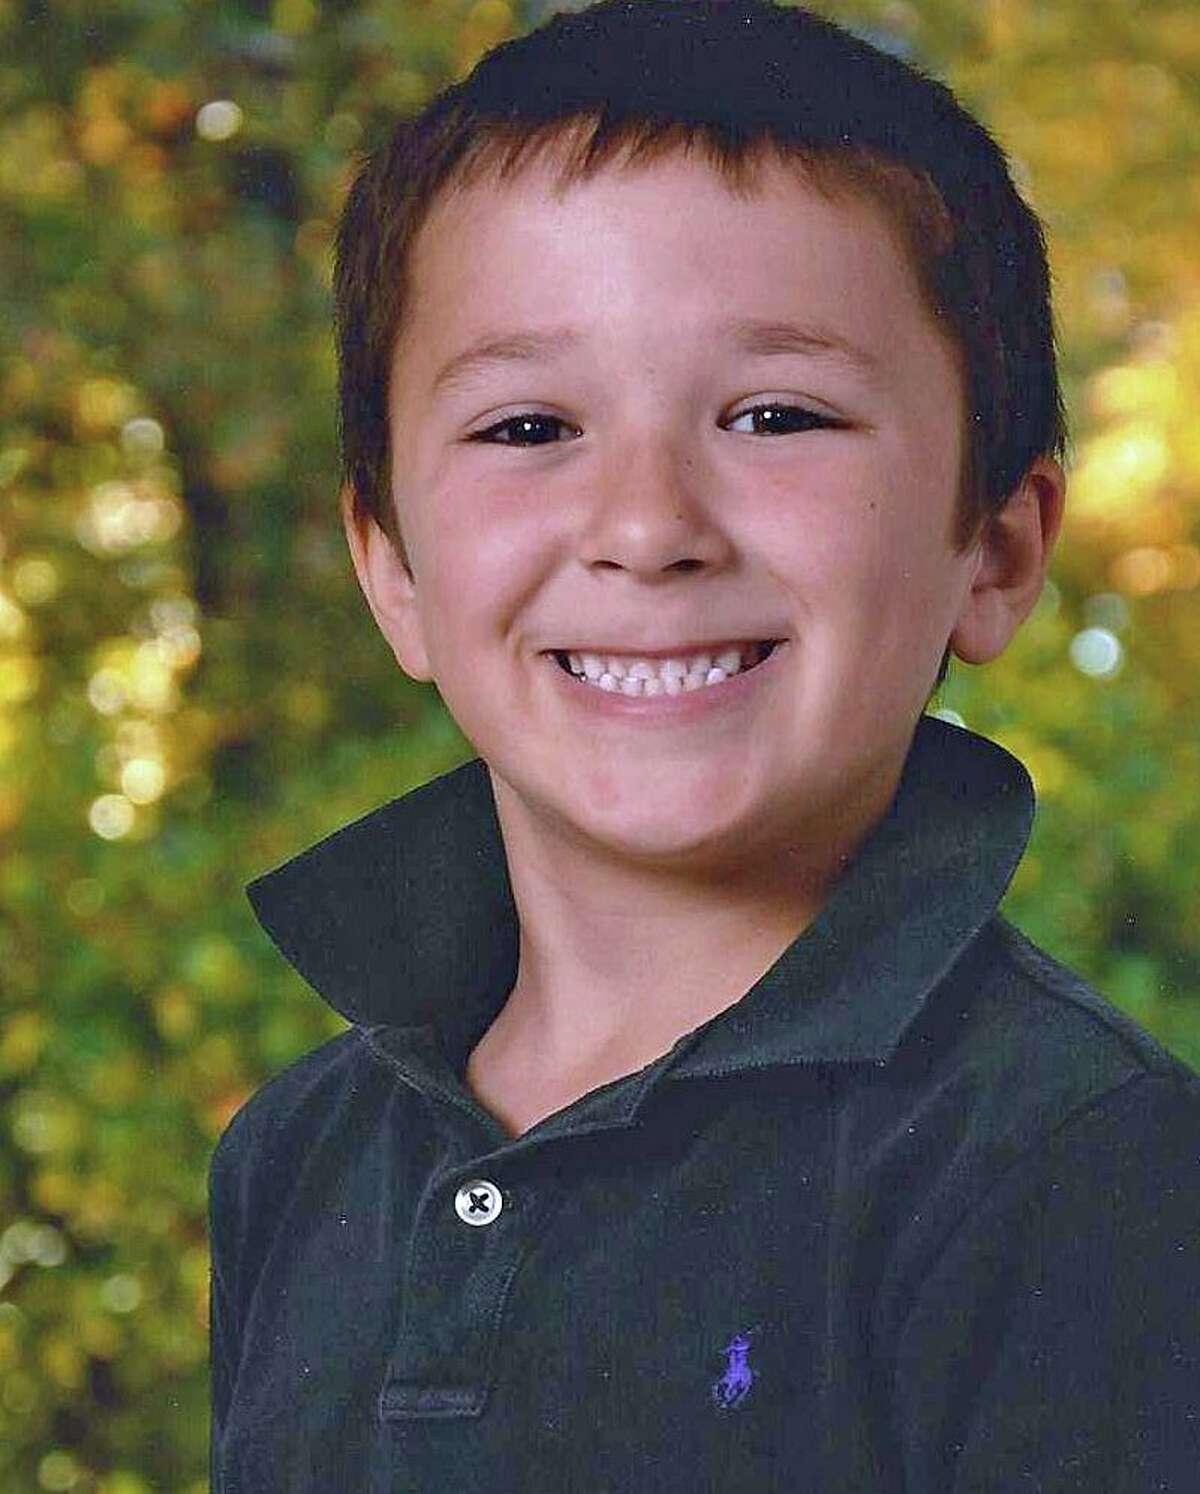 Jesse Lewis was killed in the Sandy Hook shooting in 2012.